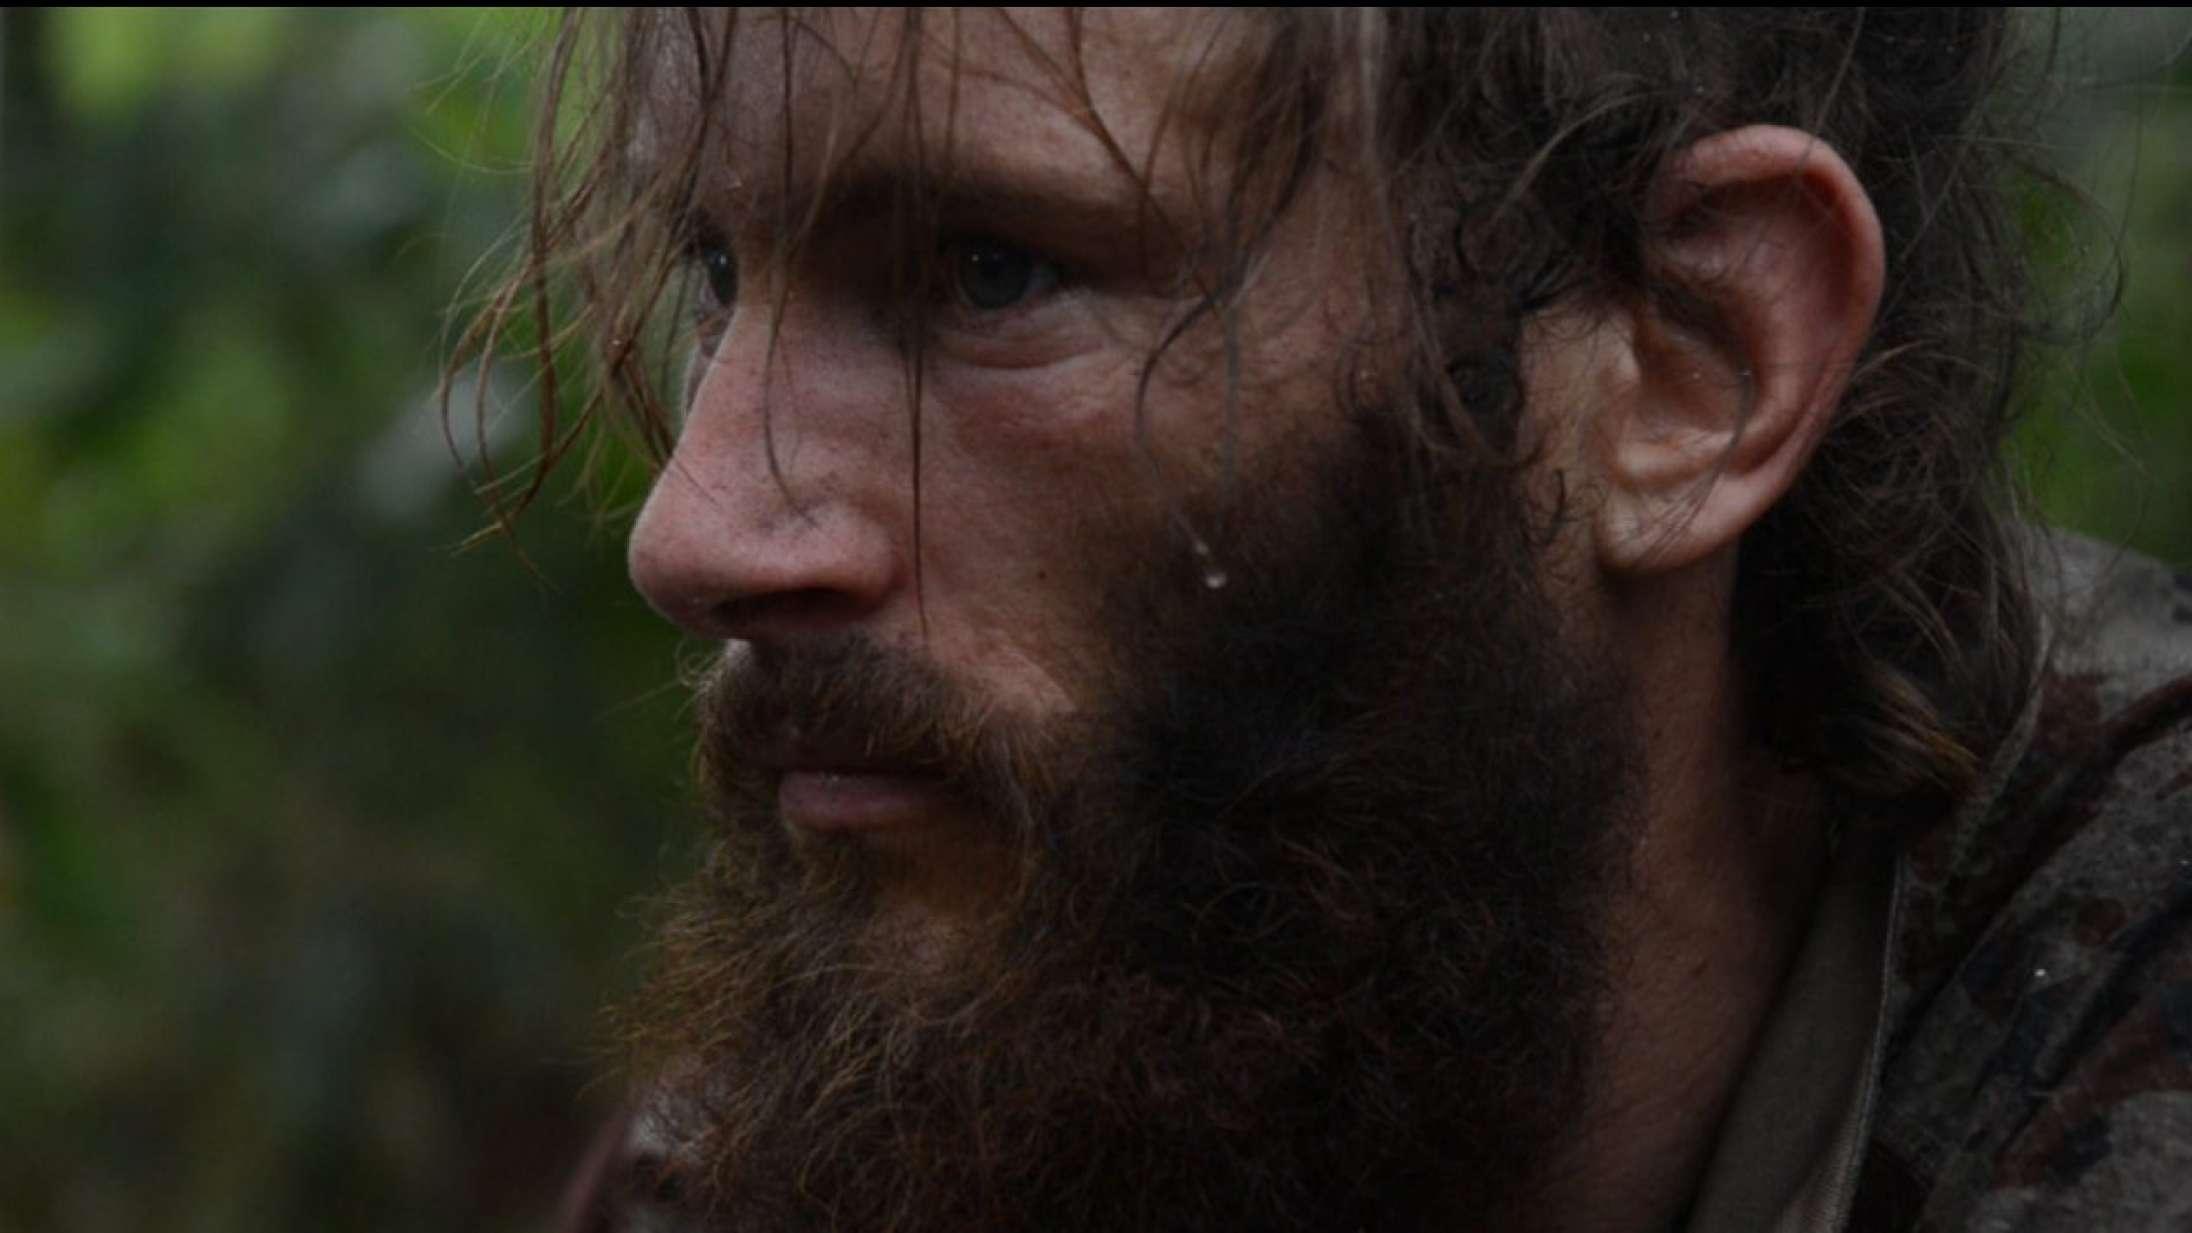 'Soldaten': Dansk krigsveteran slås med PTSD dybt inde i Amazonas-junglen